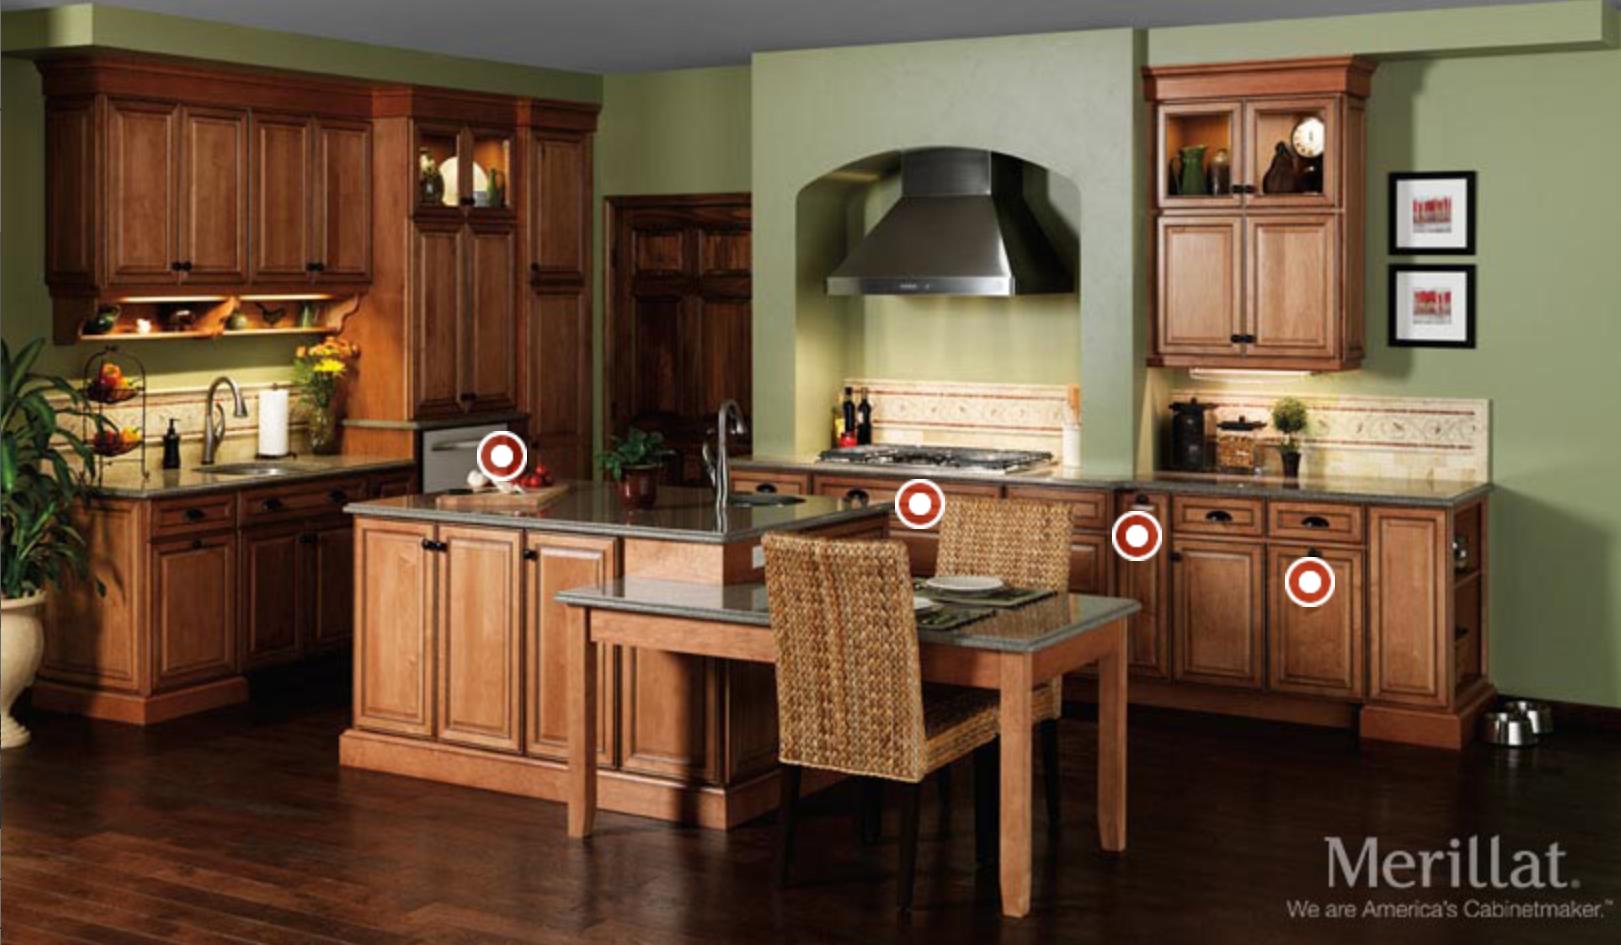 merillat cabinets interactive image